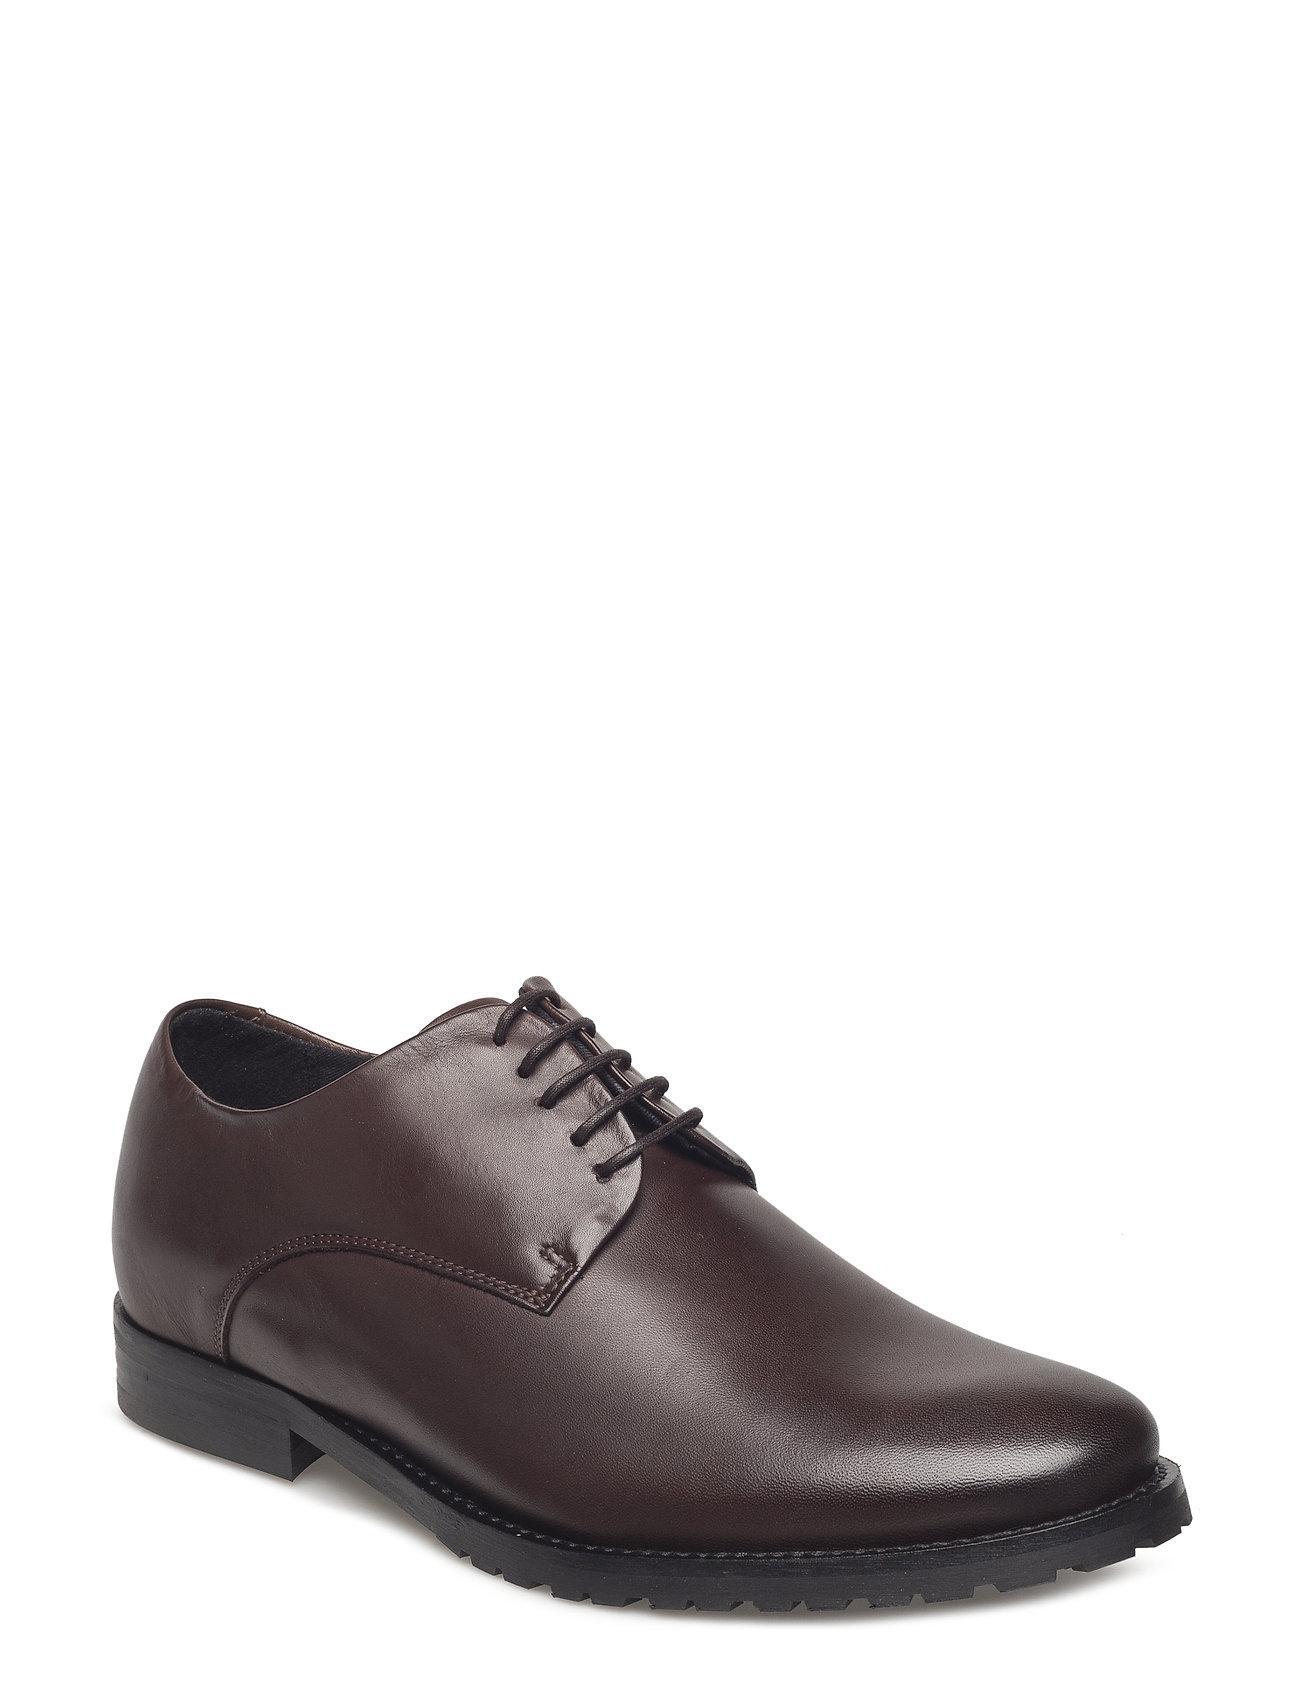 Image of Nano Derby Shoe Shoes Business Laced Shoes Brun Royal RepubliQ (3052920883)